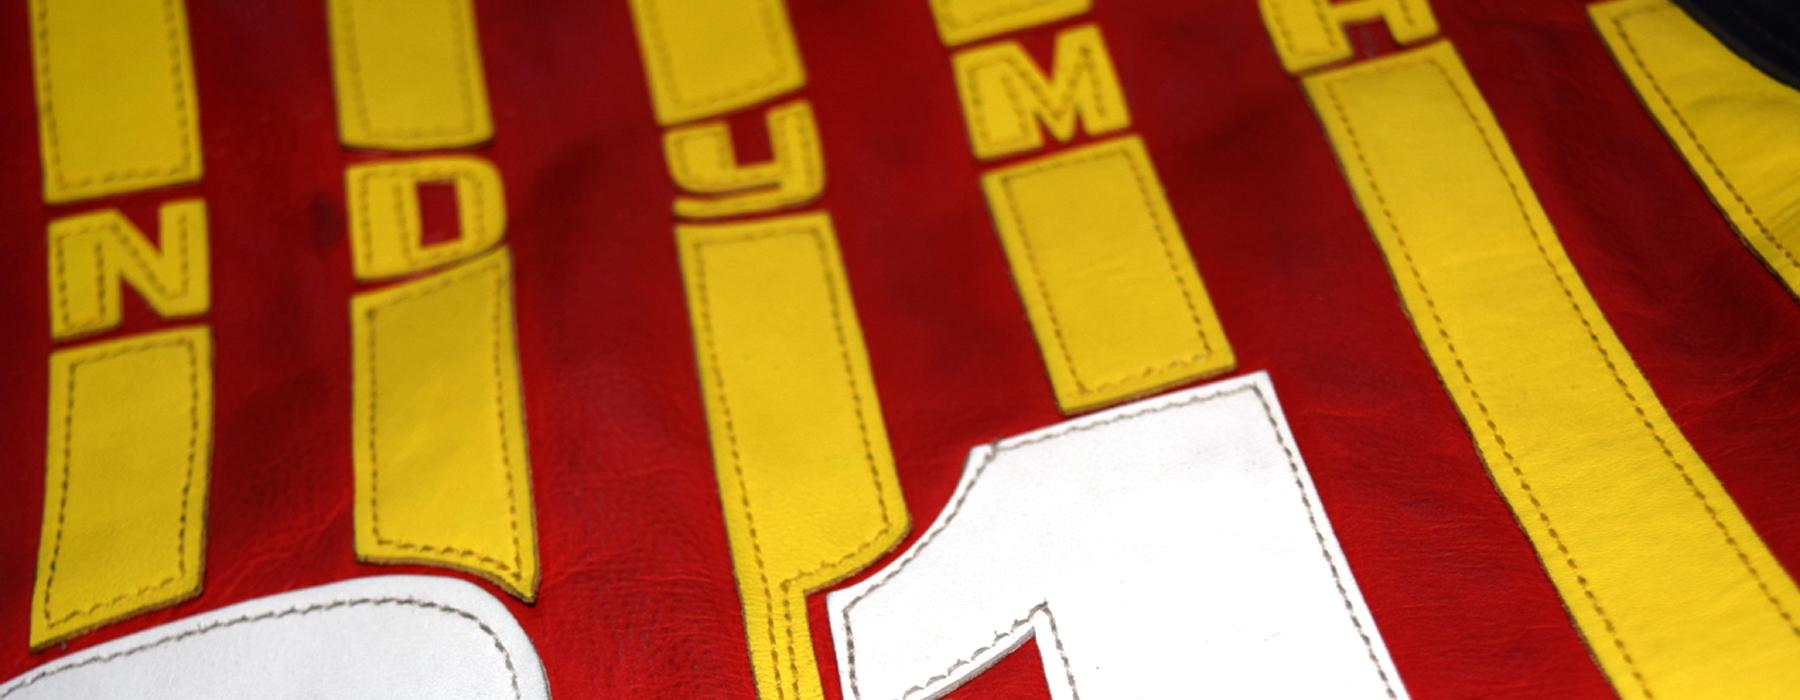 de curae | Candyman Racing Suit, vest left side detail – Thorsten Schlesinger